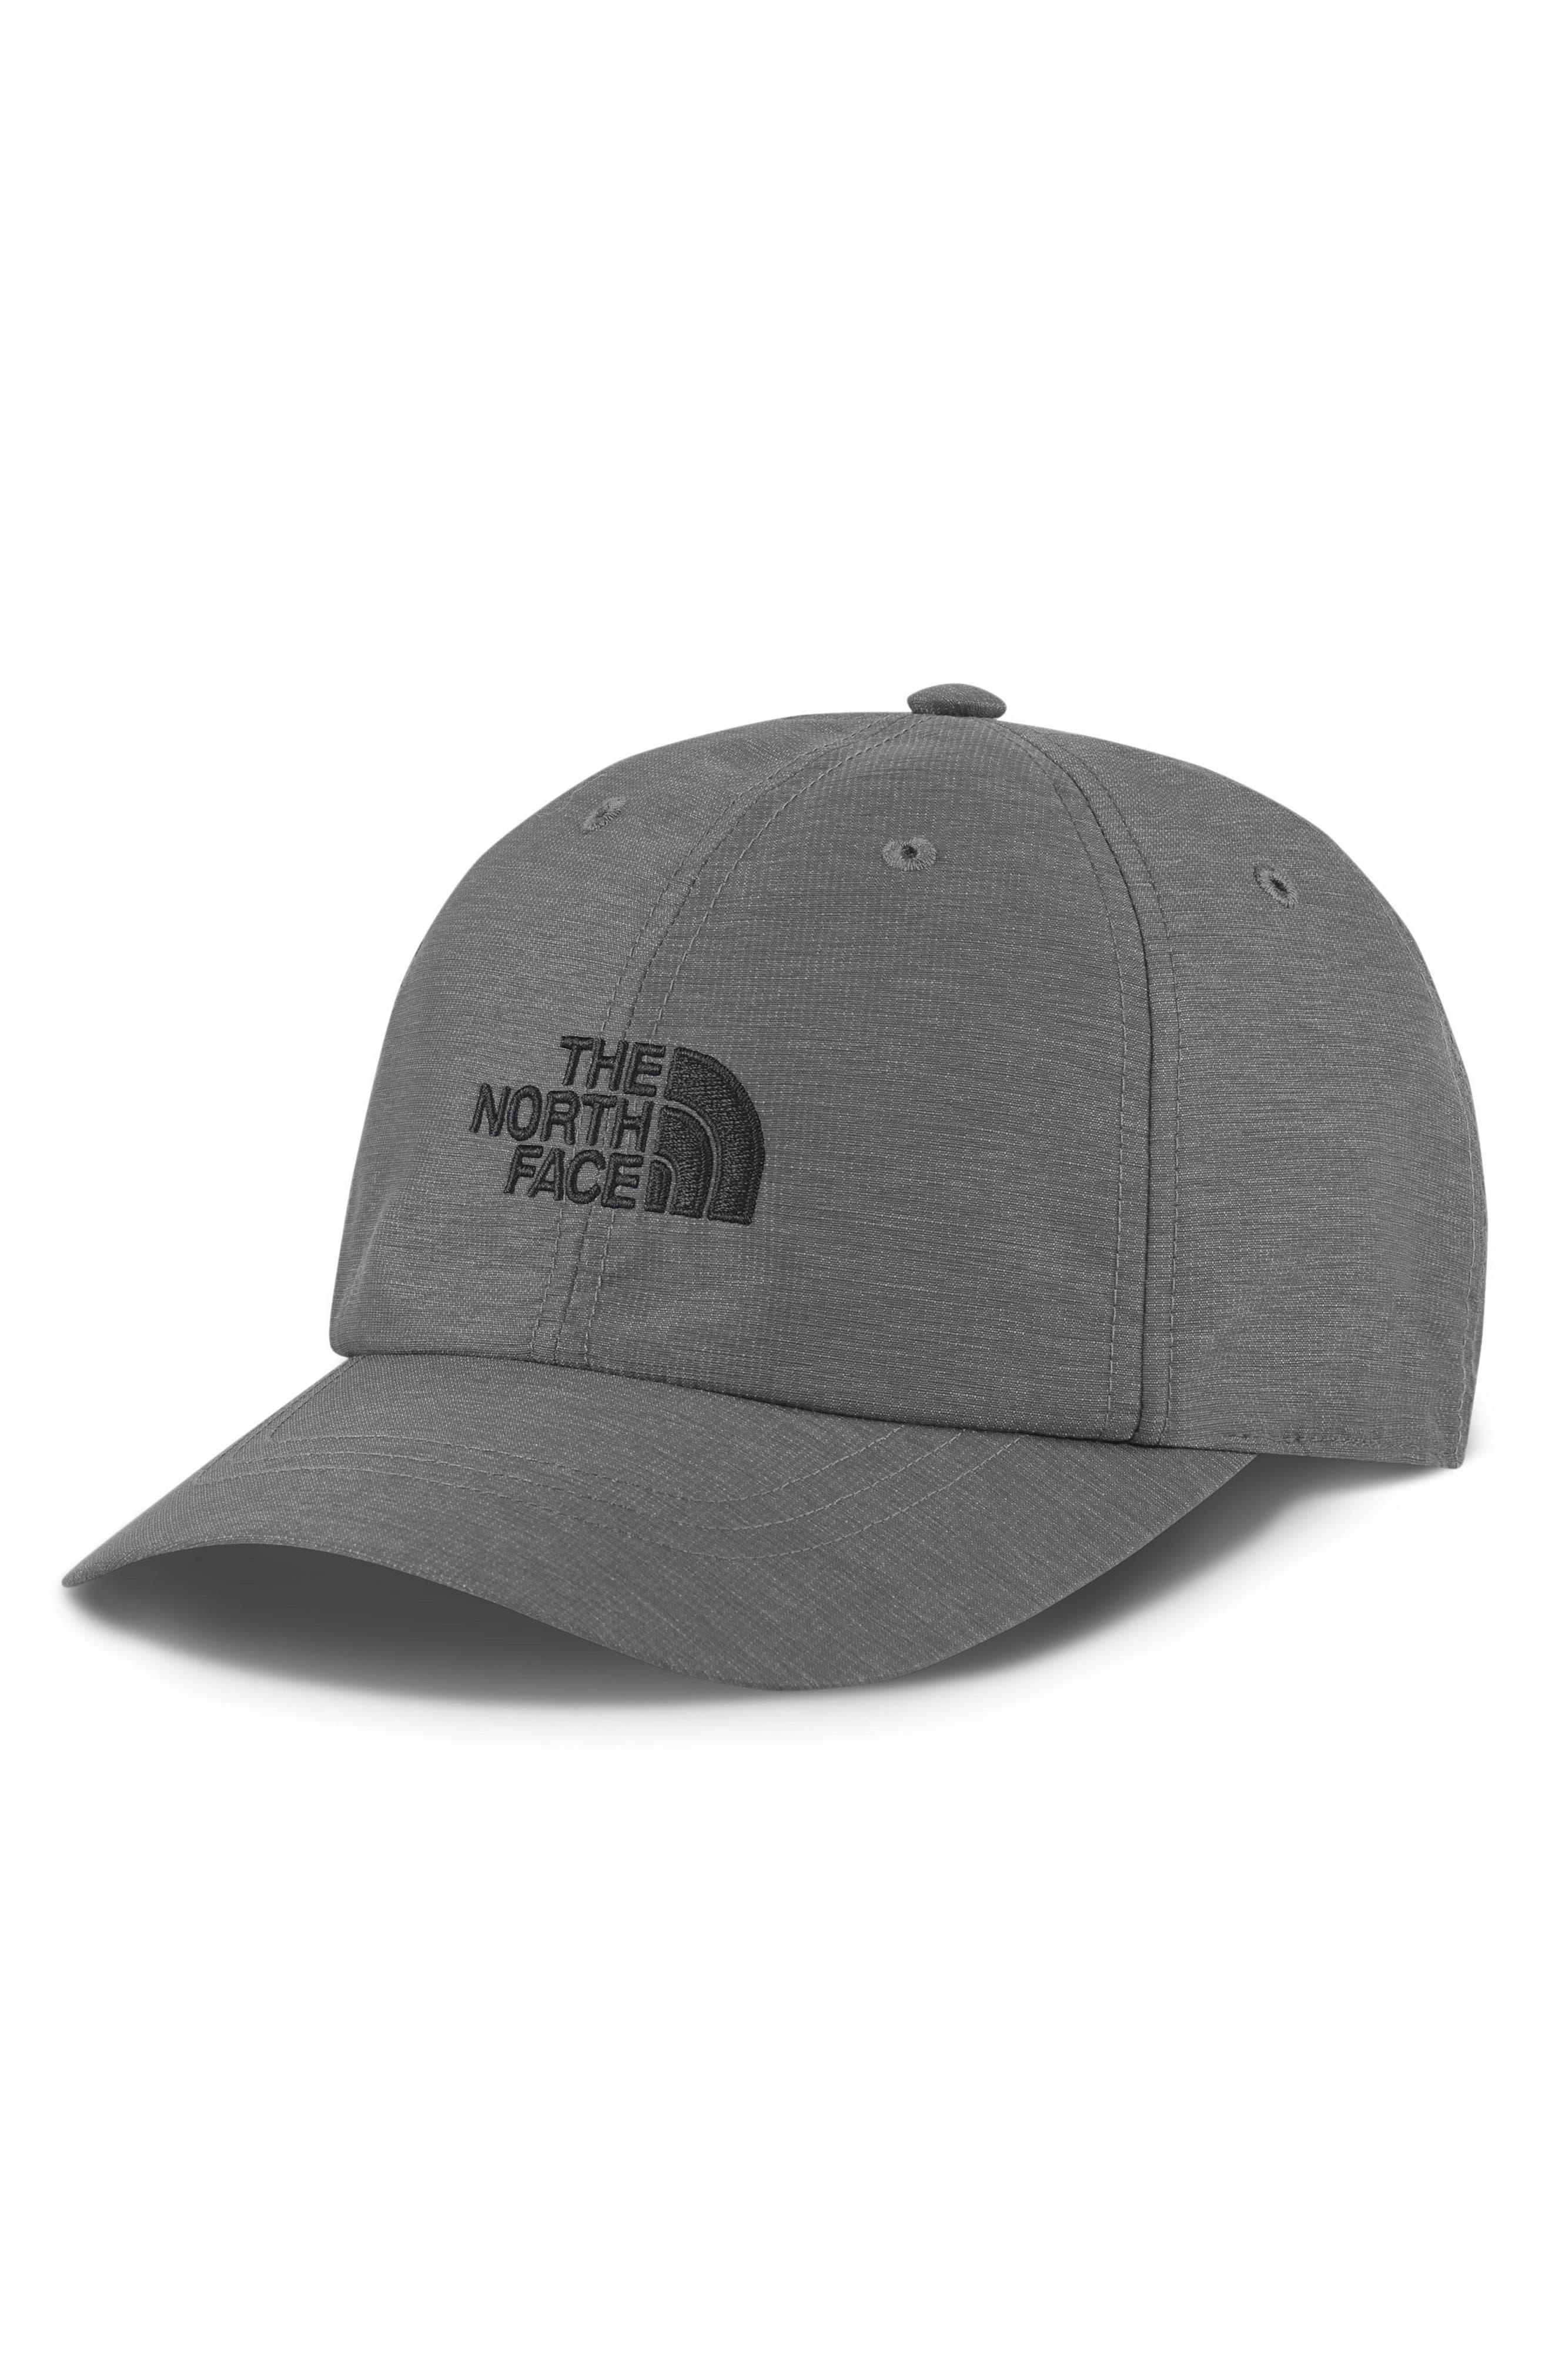 Horizon Baseball Cap,                             Main thumbnail 1, color,                             MEDIUM GREY HEATHER/ ASPHALT